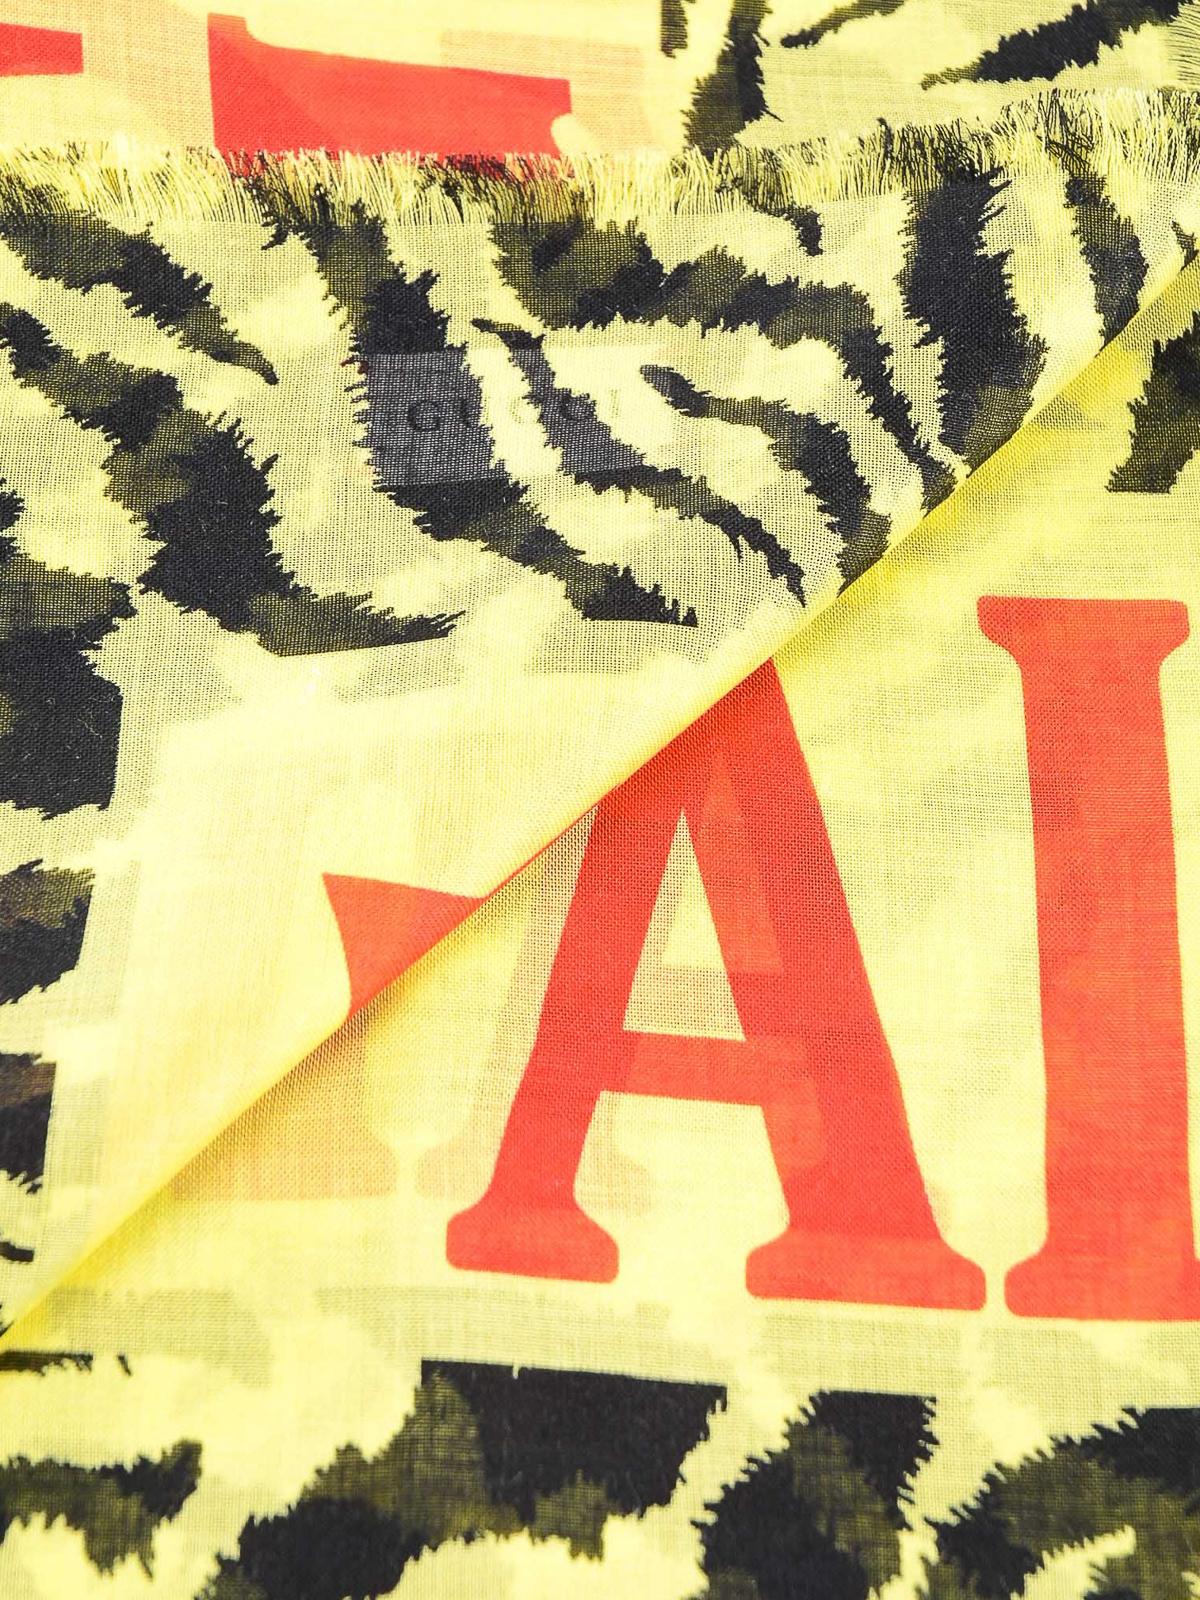 Gucci - Écharpe - Jaune Clair - Écharpes - 5596753G856 7200   iKRIX.com 27fb3eb532f